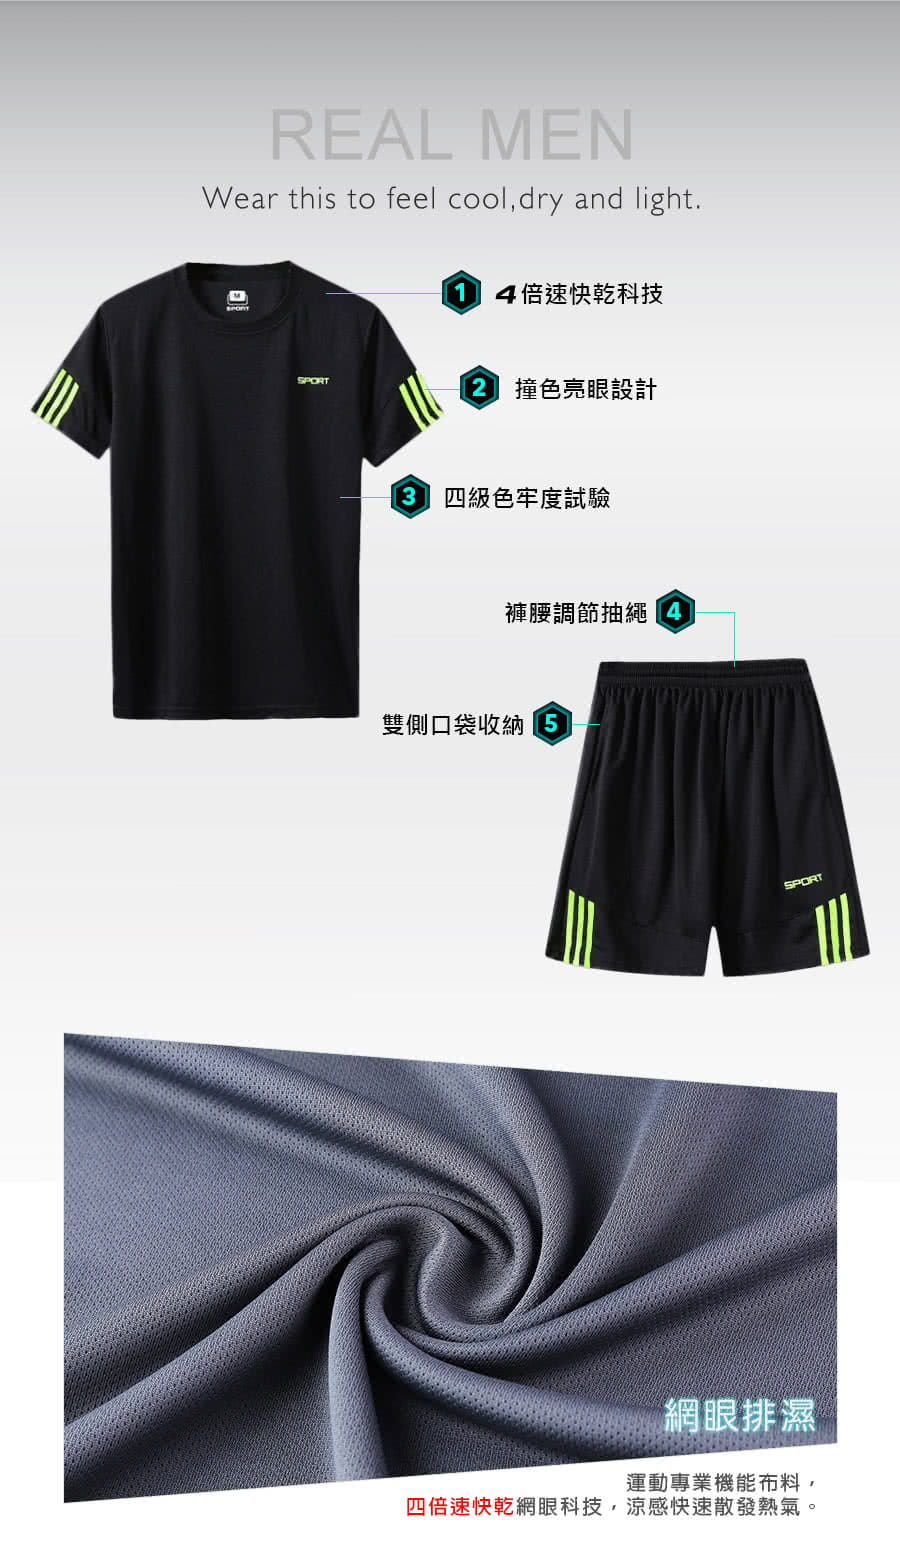 【Un-Sport高機能】SPORT男專業瞬間吸排二件式運動套裝(健身/路跑/籃球)短袖+短褲 3